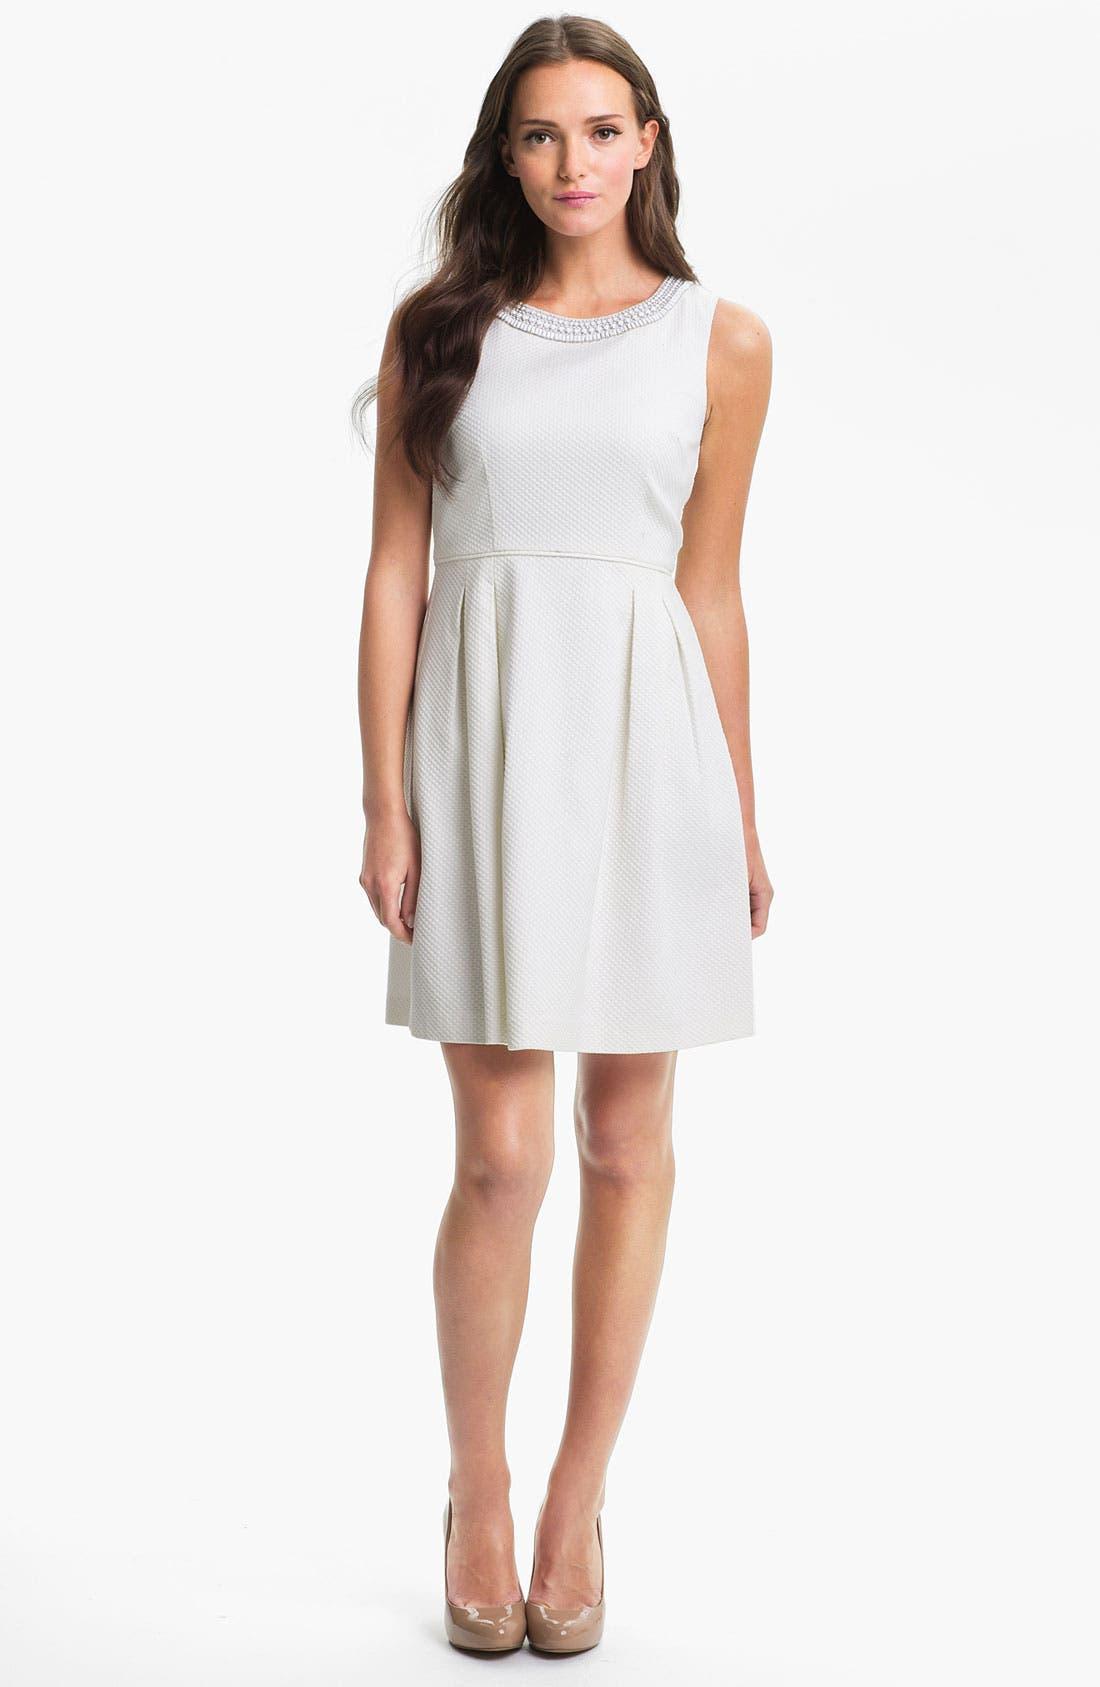 Alternate Image 1 Selected - Trina Turk 'Seles' Embellished Fit & Flare Dress